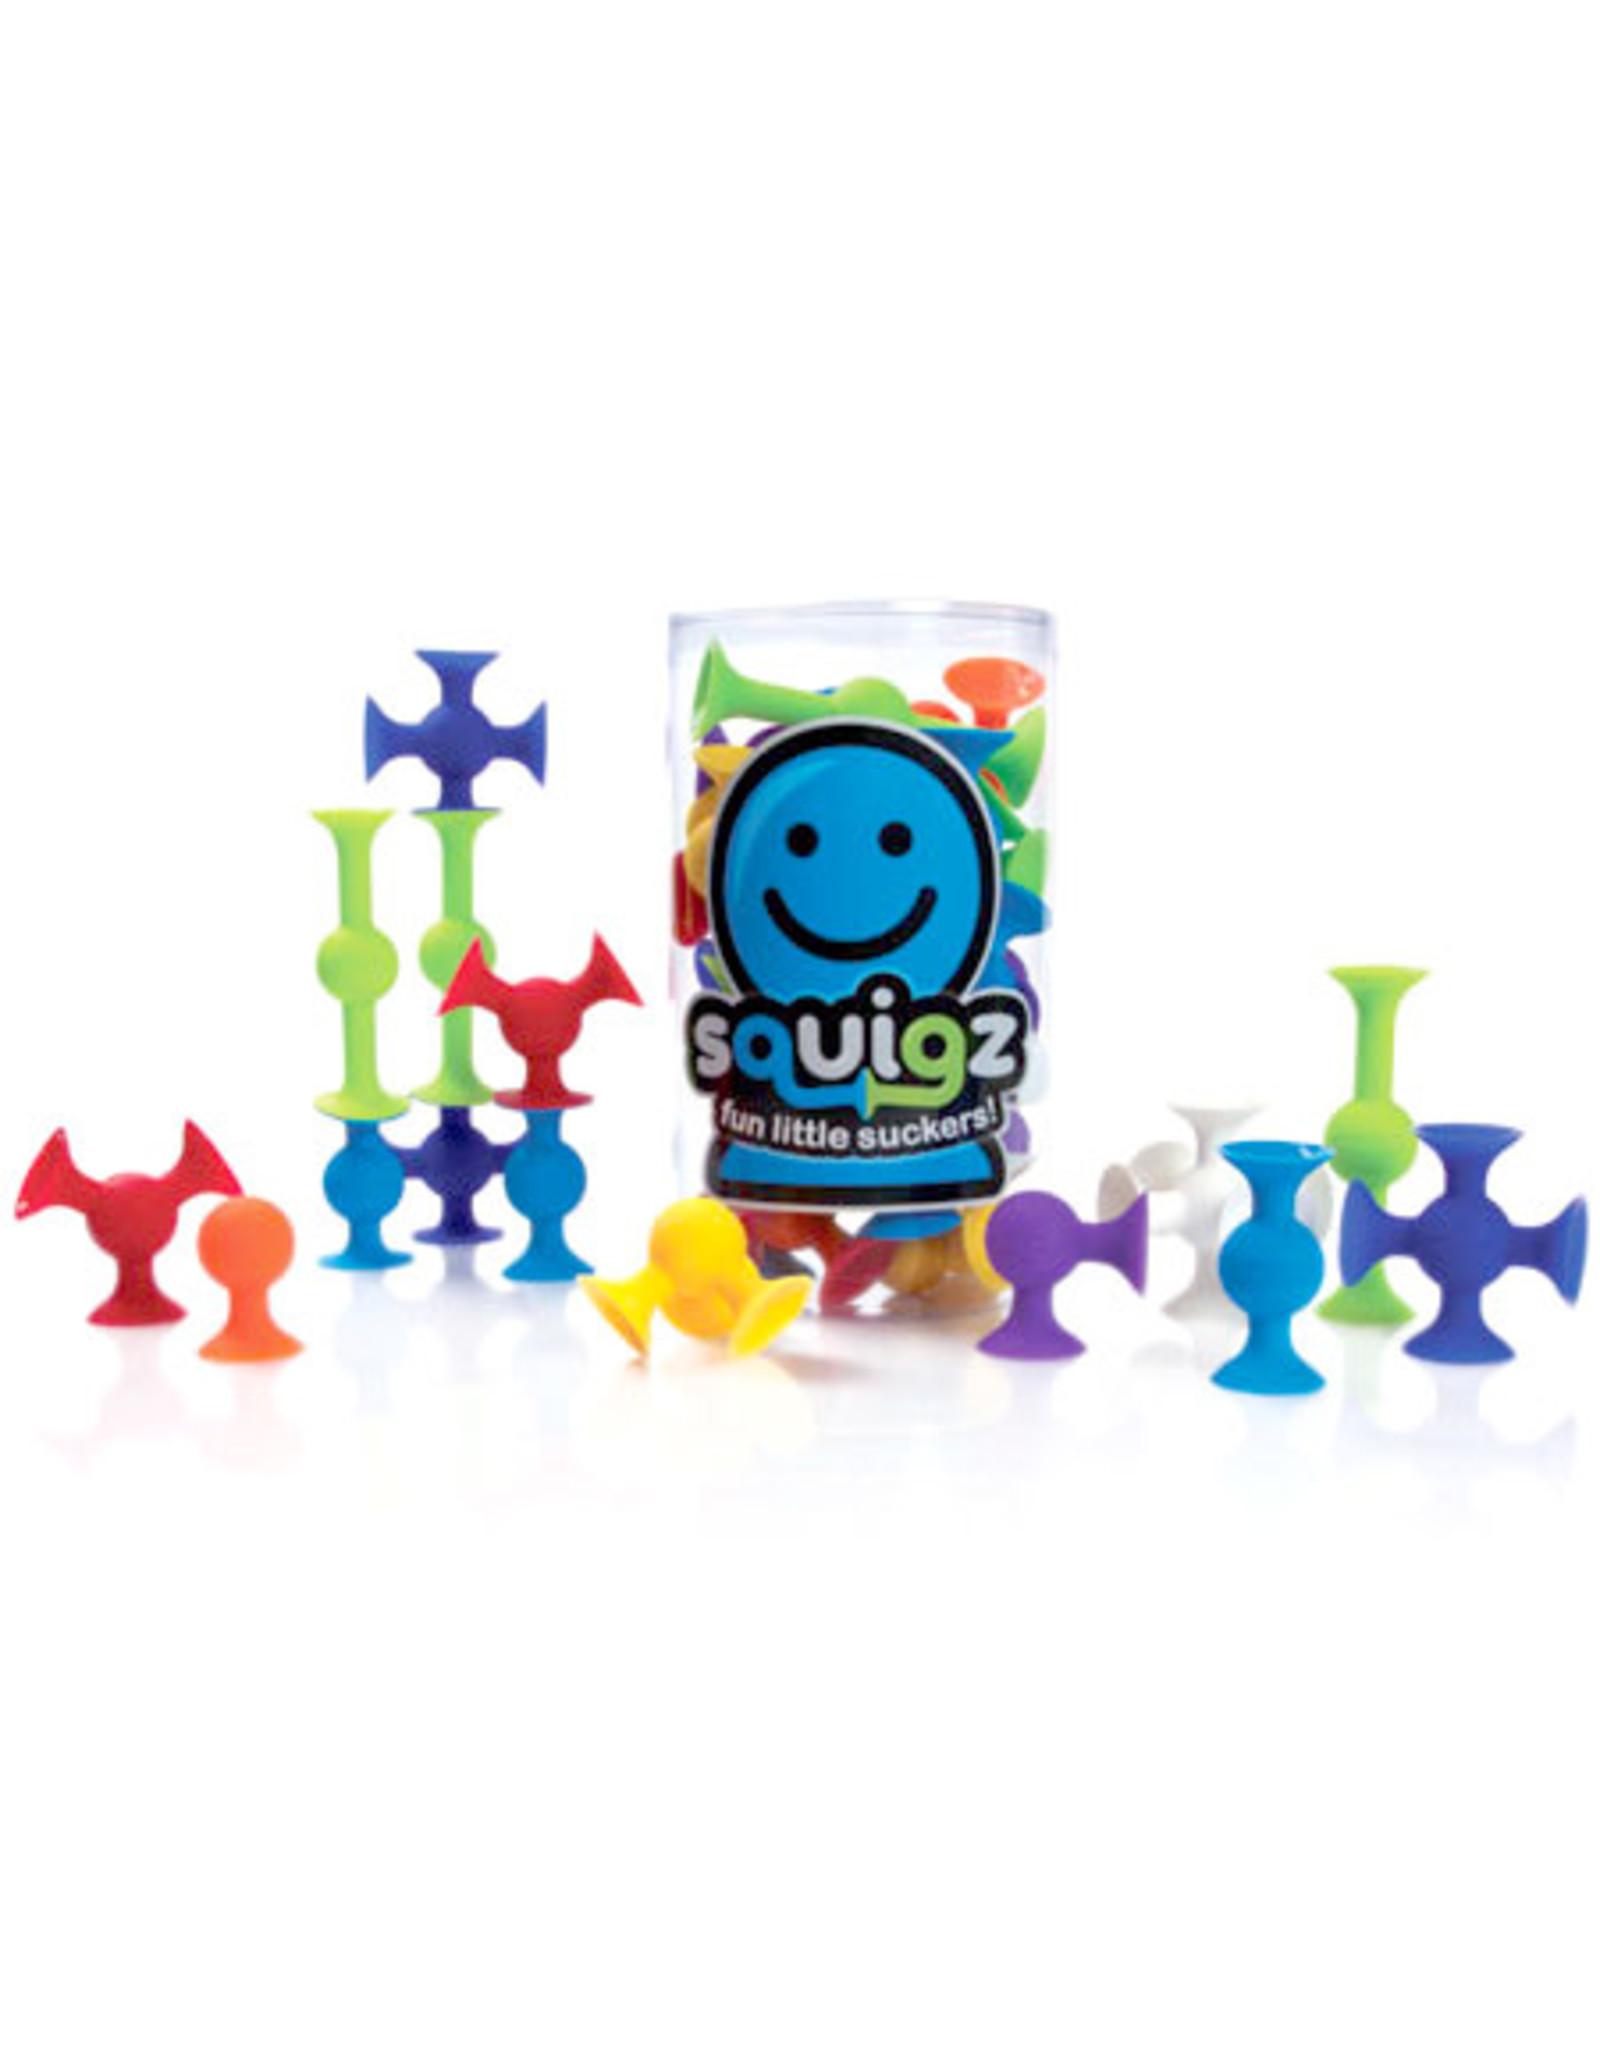 Fat Brain Toy Co. Squigz, Starter Set, 24 pcs